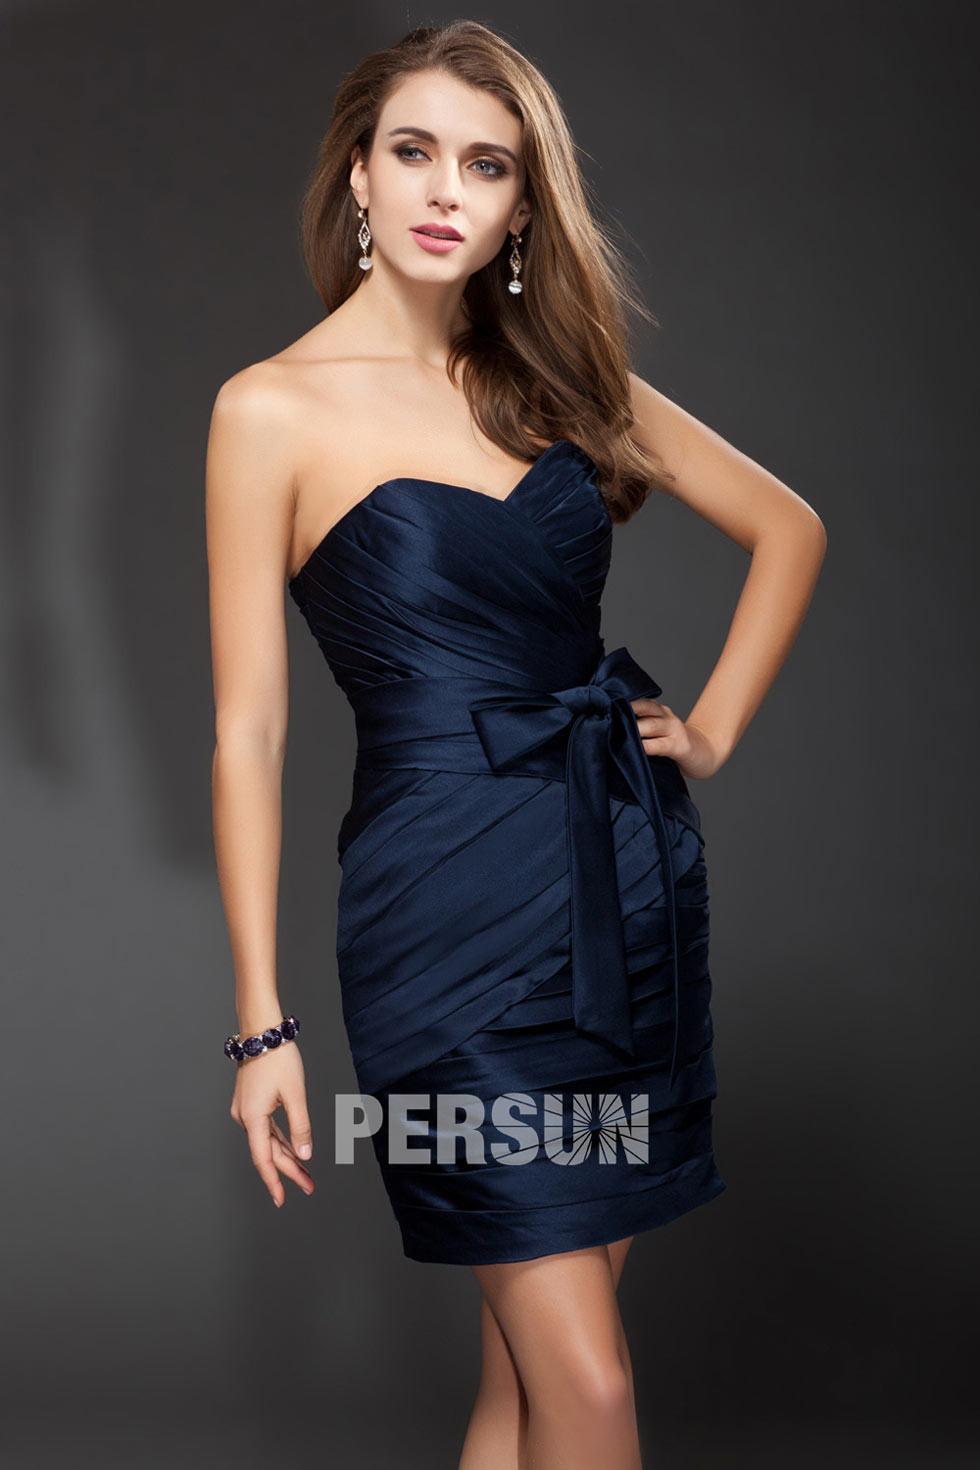 Designer Luxurius Kostbares Abendkleid Vertrieb13 Schön Kostbares Abendkleid Spezialgebiet